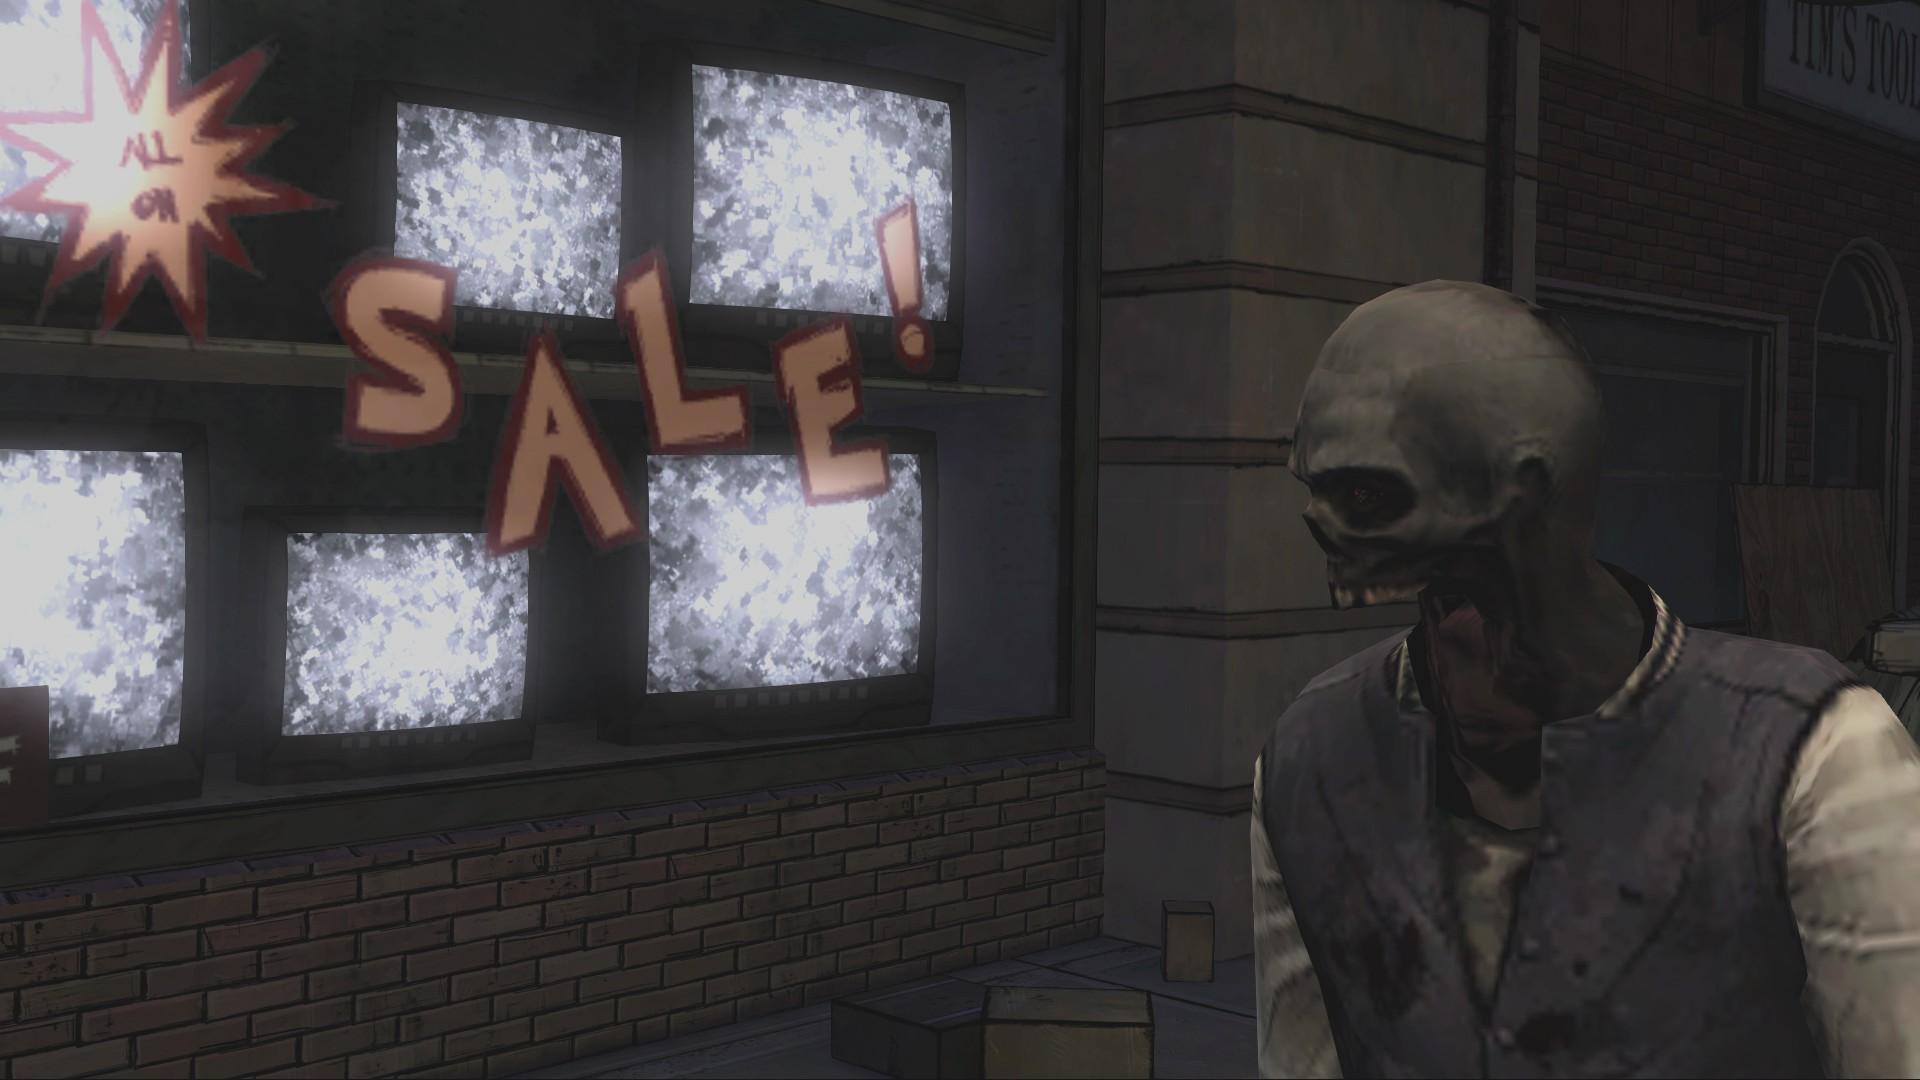 Test-Video The Walking Dead: Gefühlschaos nach der Zombieapokalypse - Zombie entdeckt Sommerschlussverkauf.